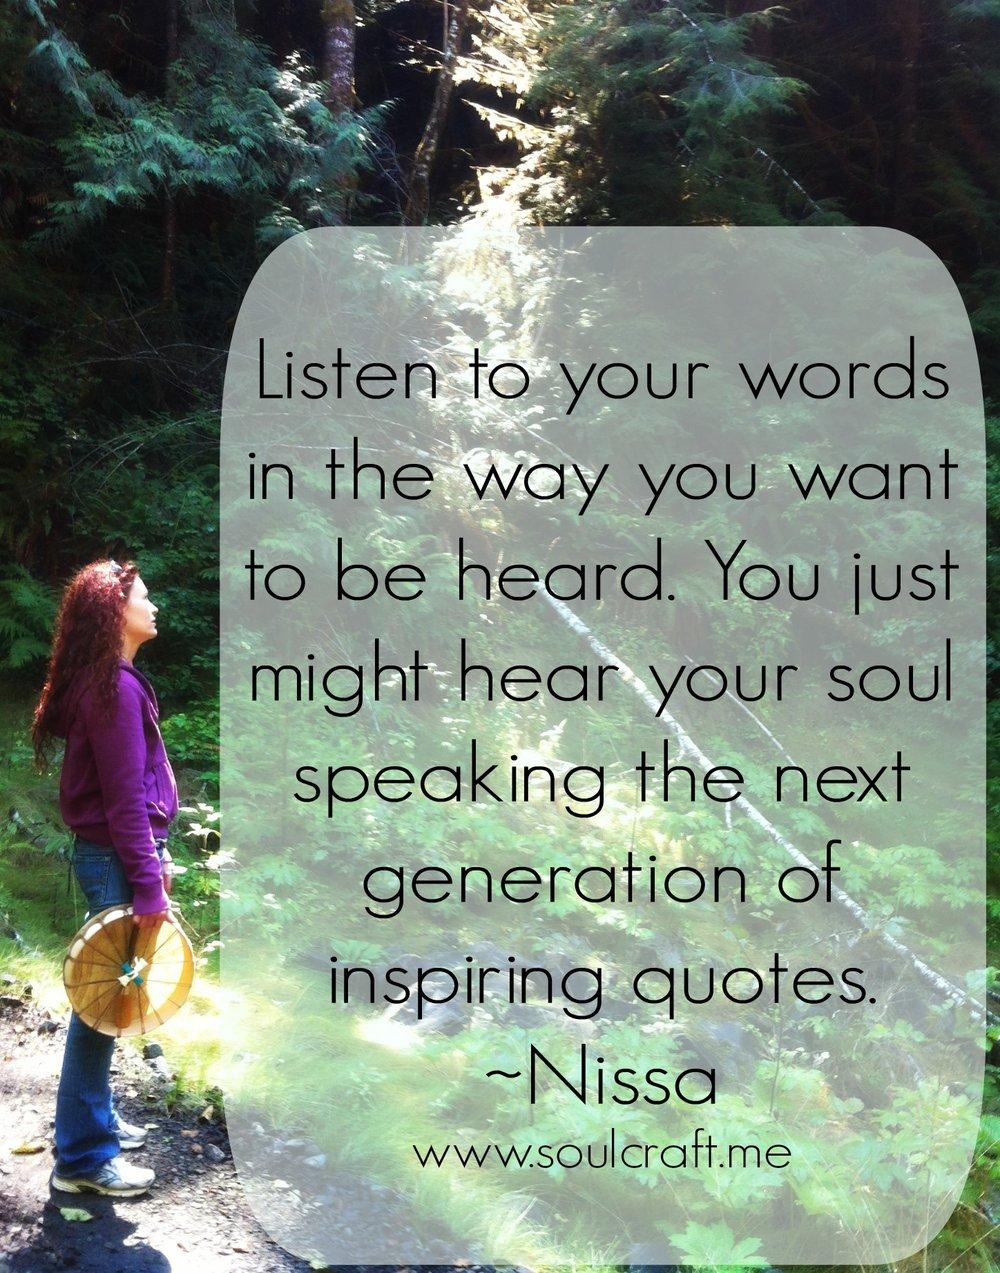 listentoyourwords.jpg